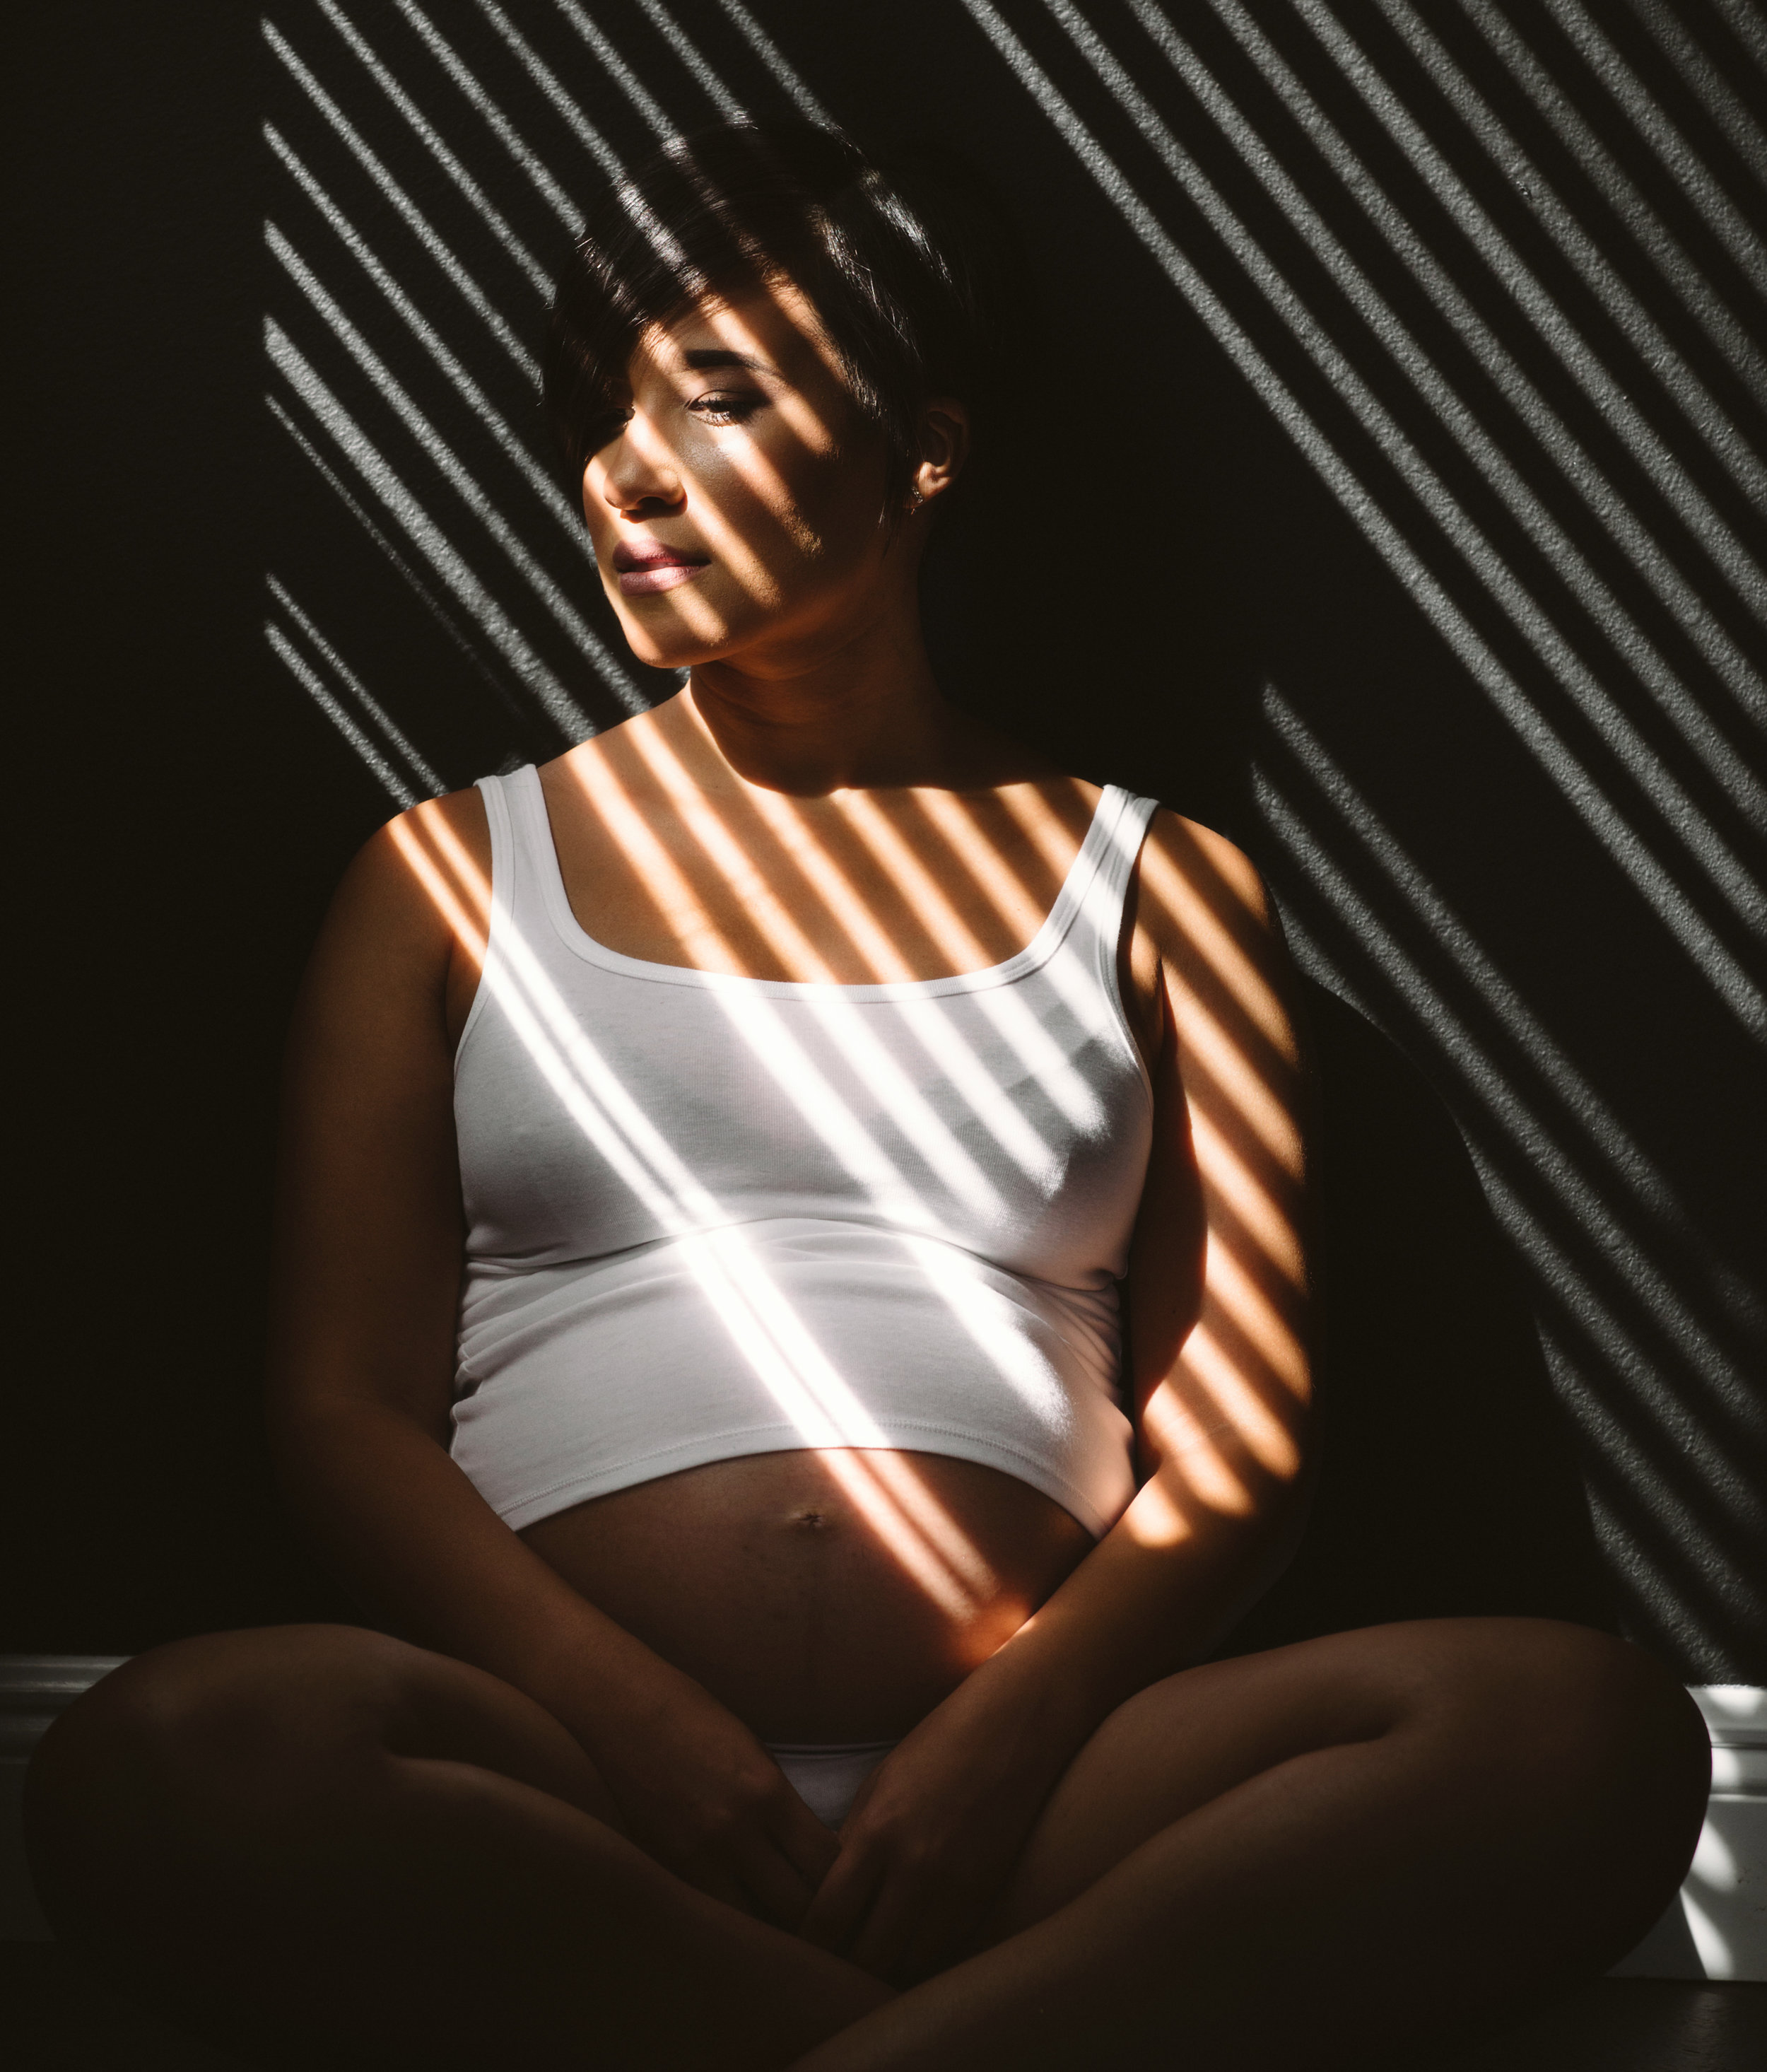 Indoor Lifestlye Maternity Session | Vanessa Boy | Vanessaboy.com |orlando,fl-300.com |final.jpg